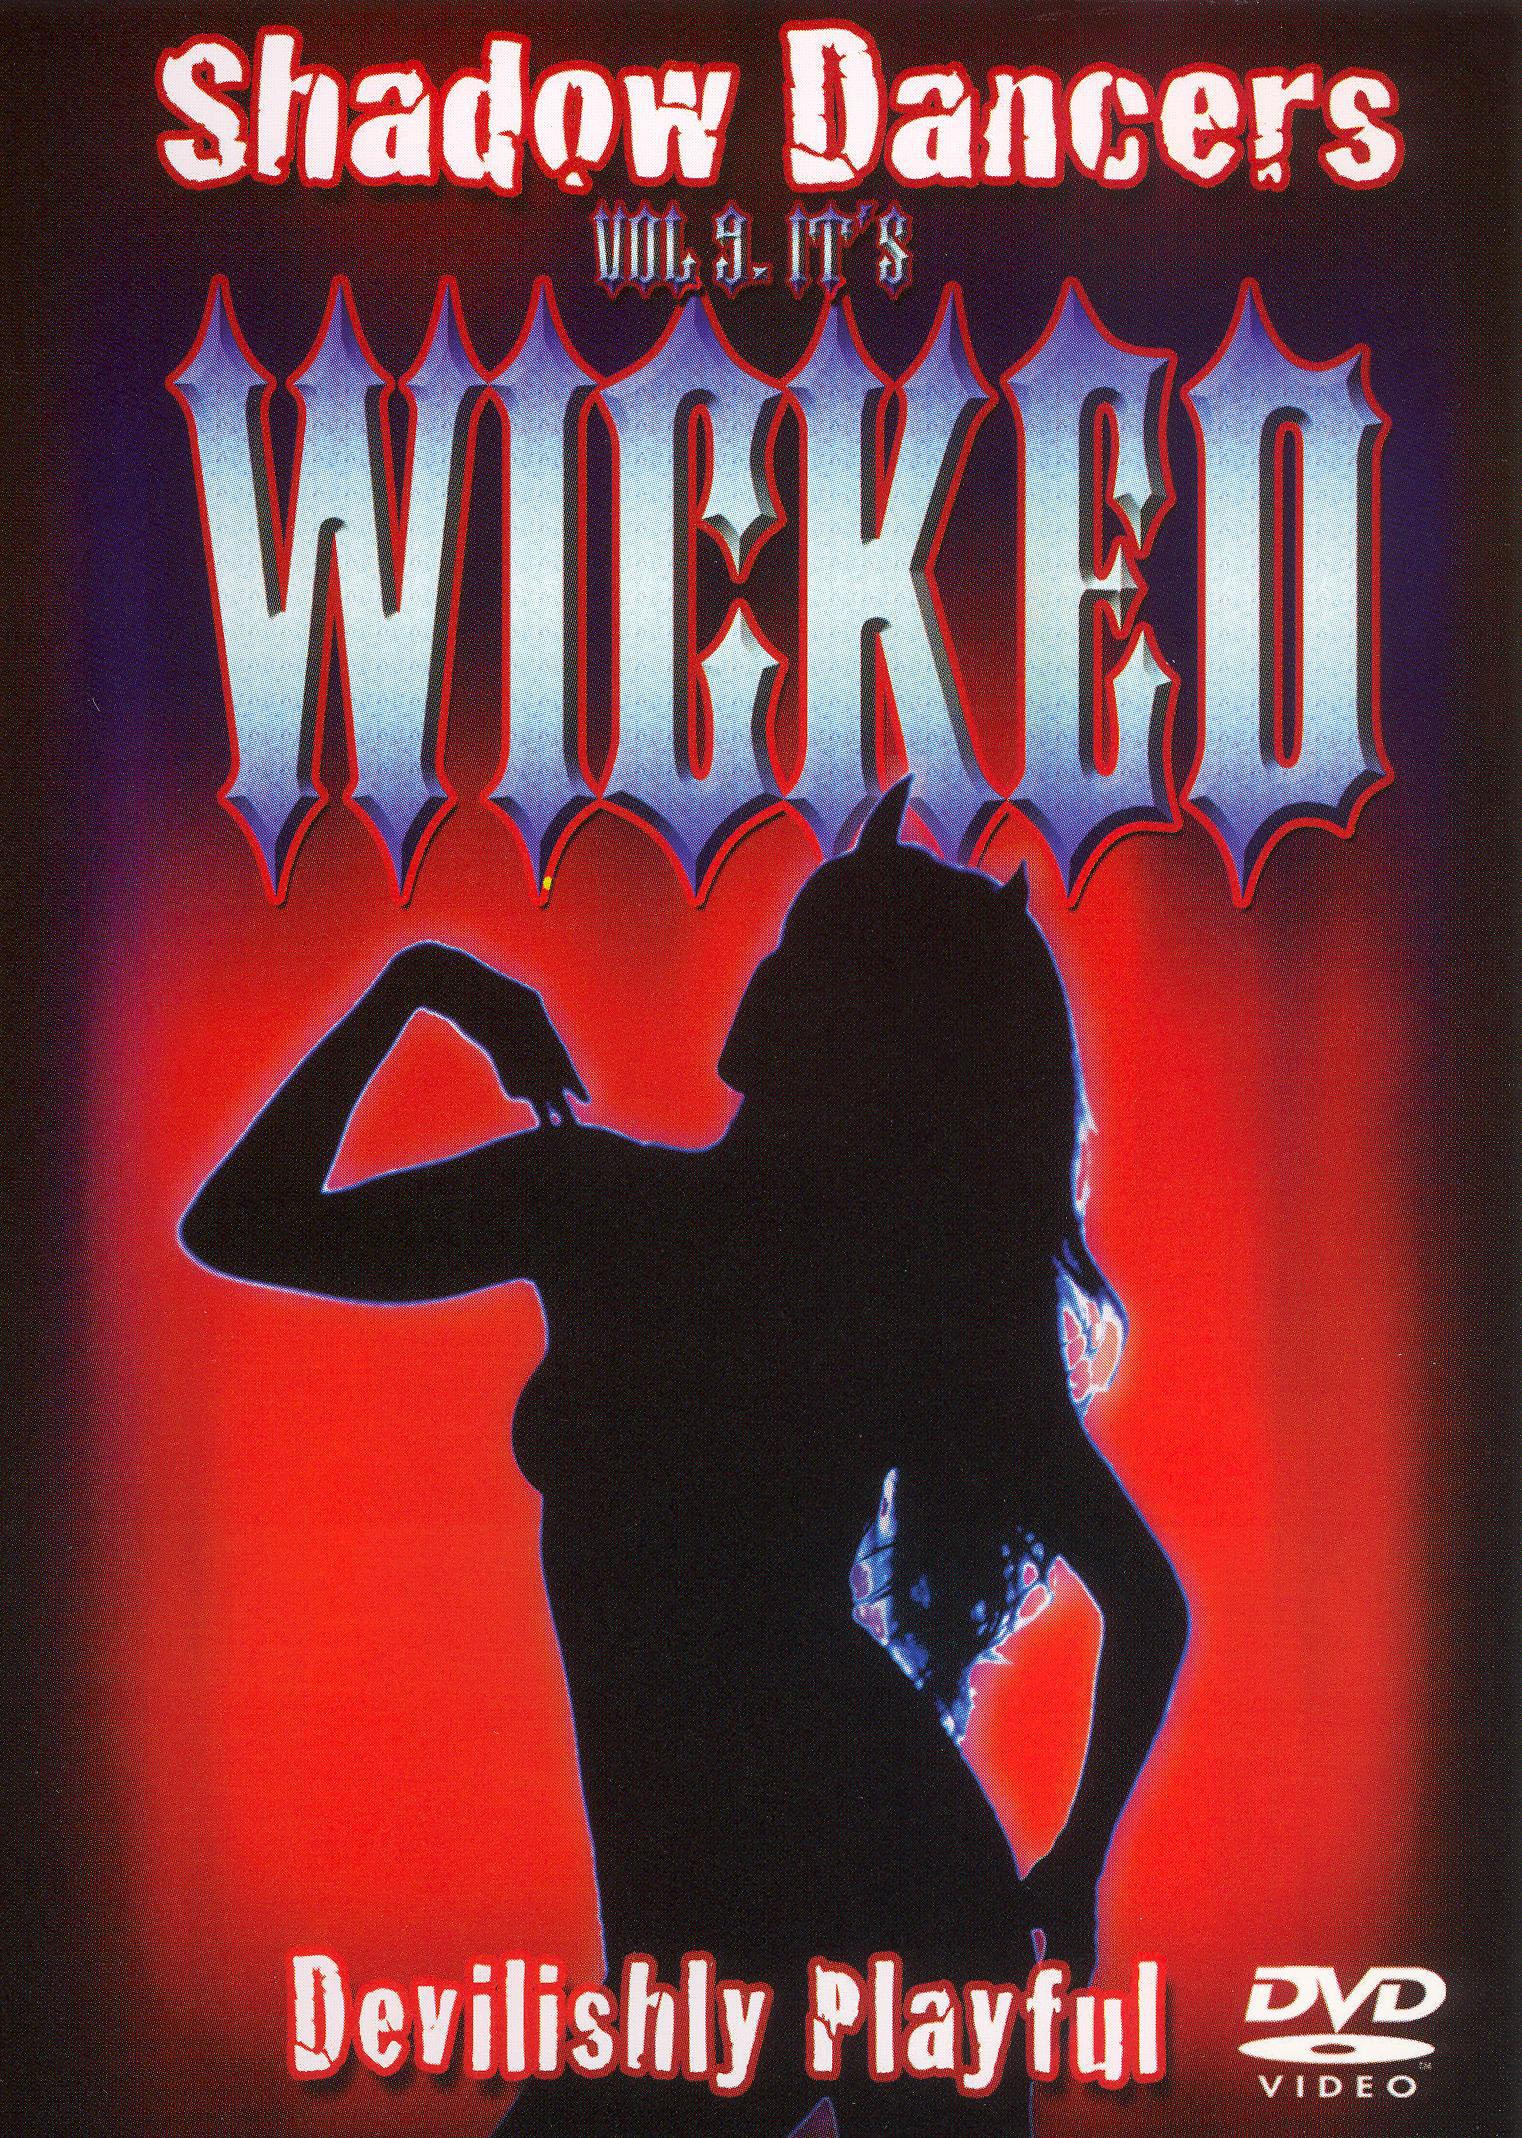 Shadow Dancers, Vol. 9: It's Wicked